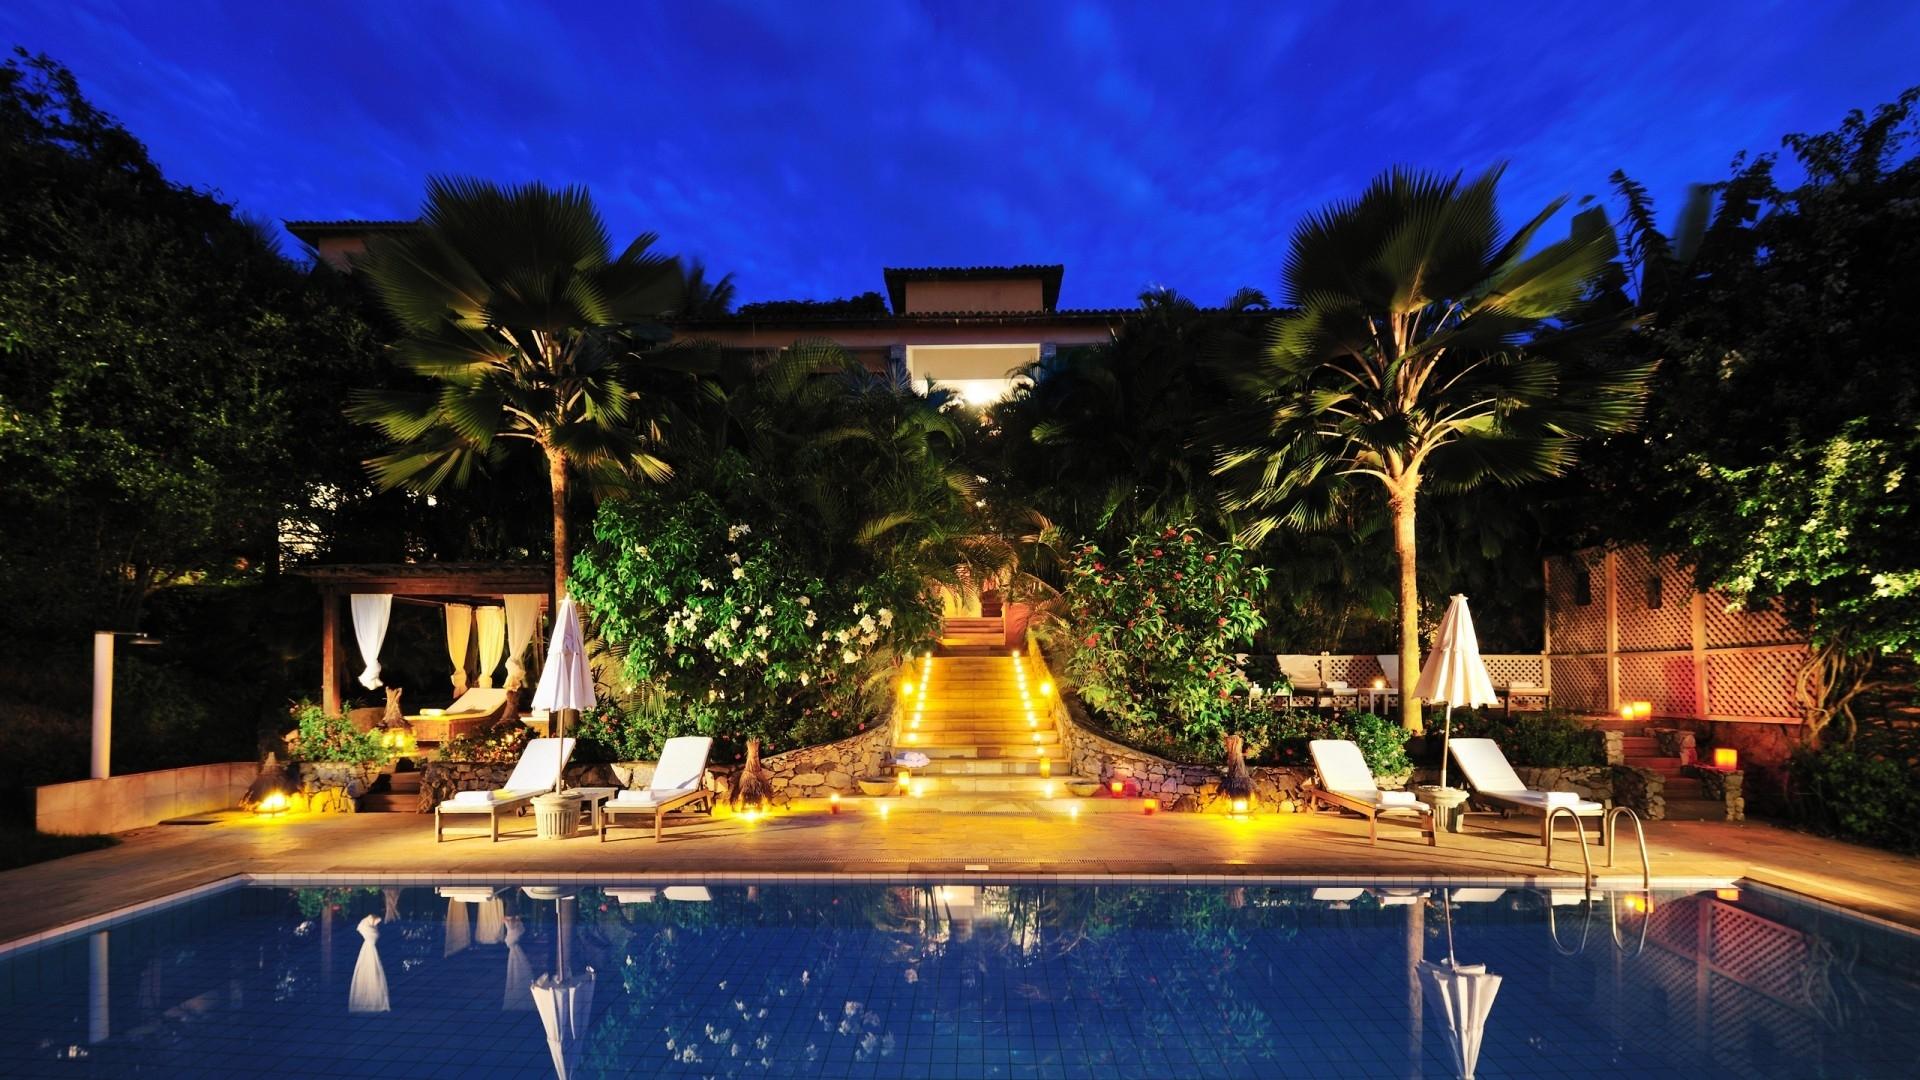 Wallpaper Night Swimming Pool Resort Palace Vacation